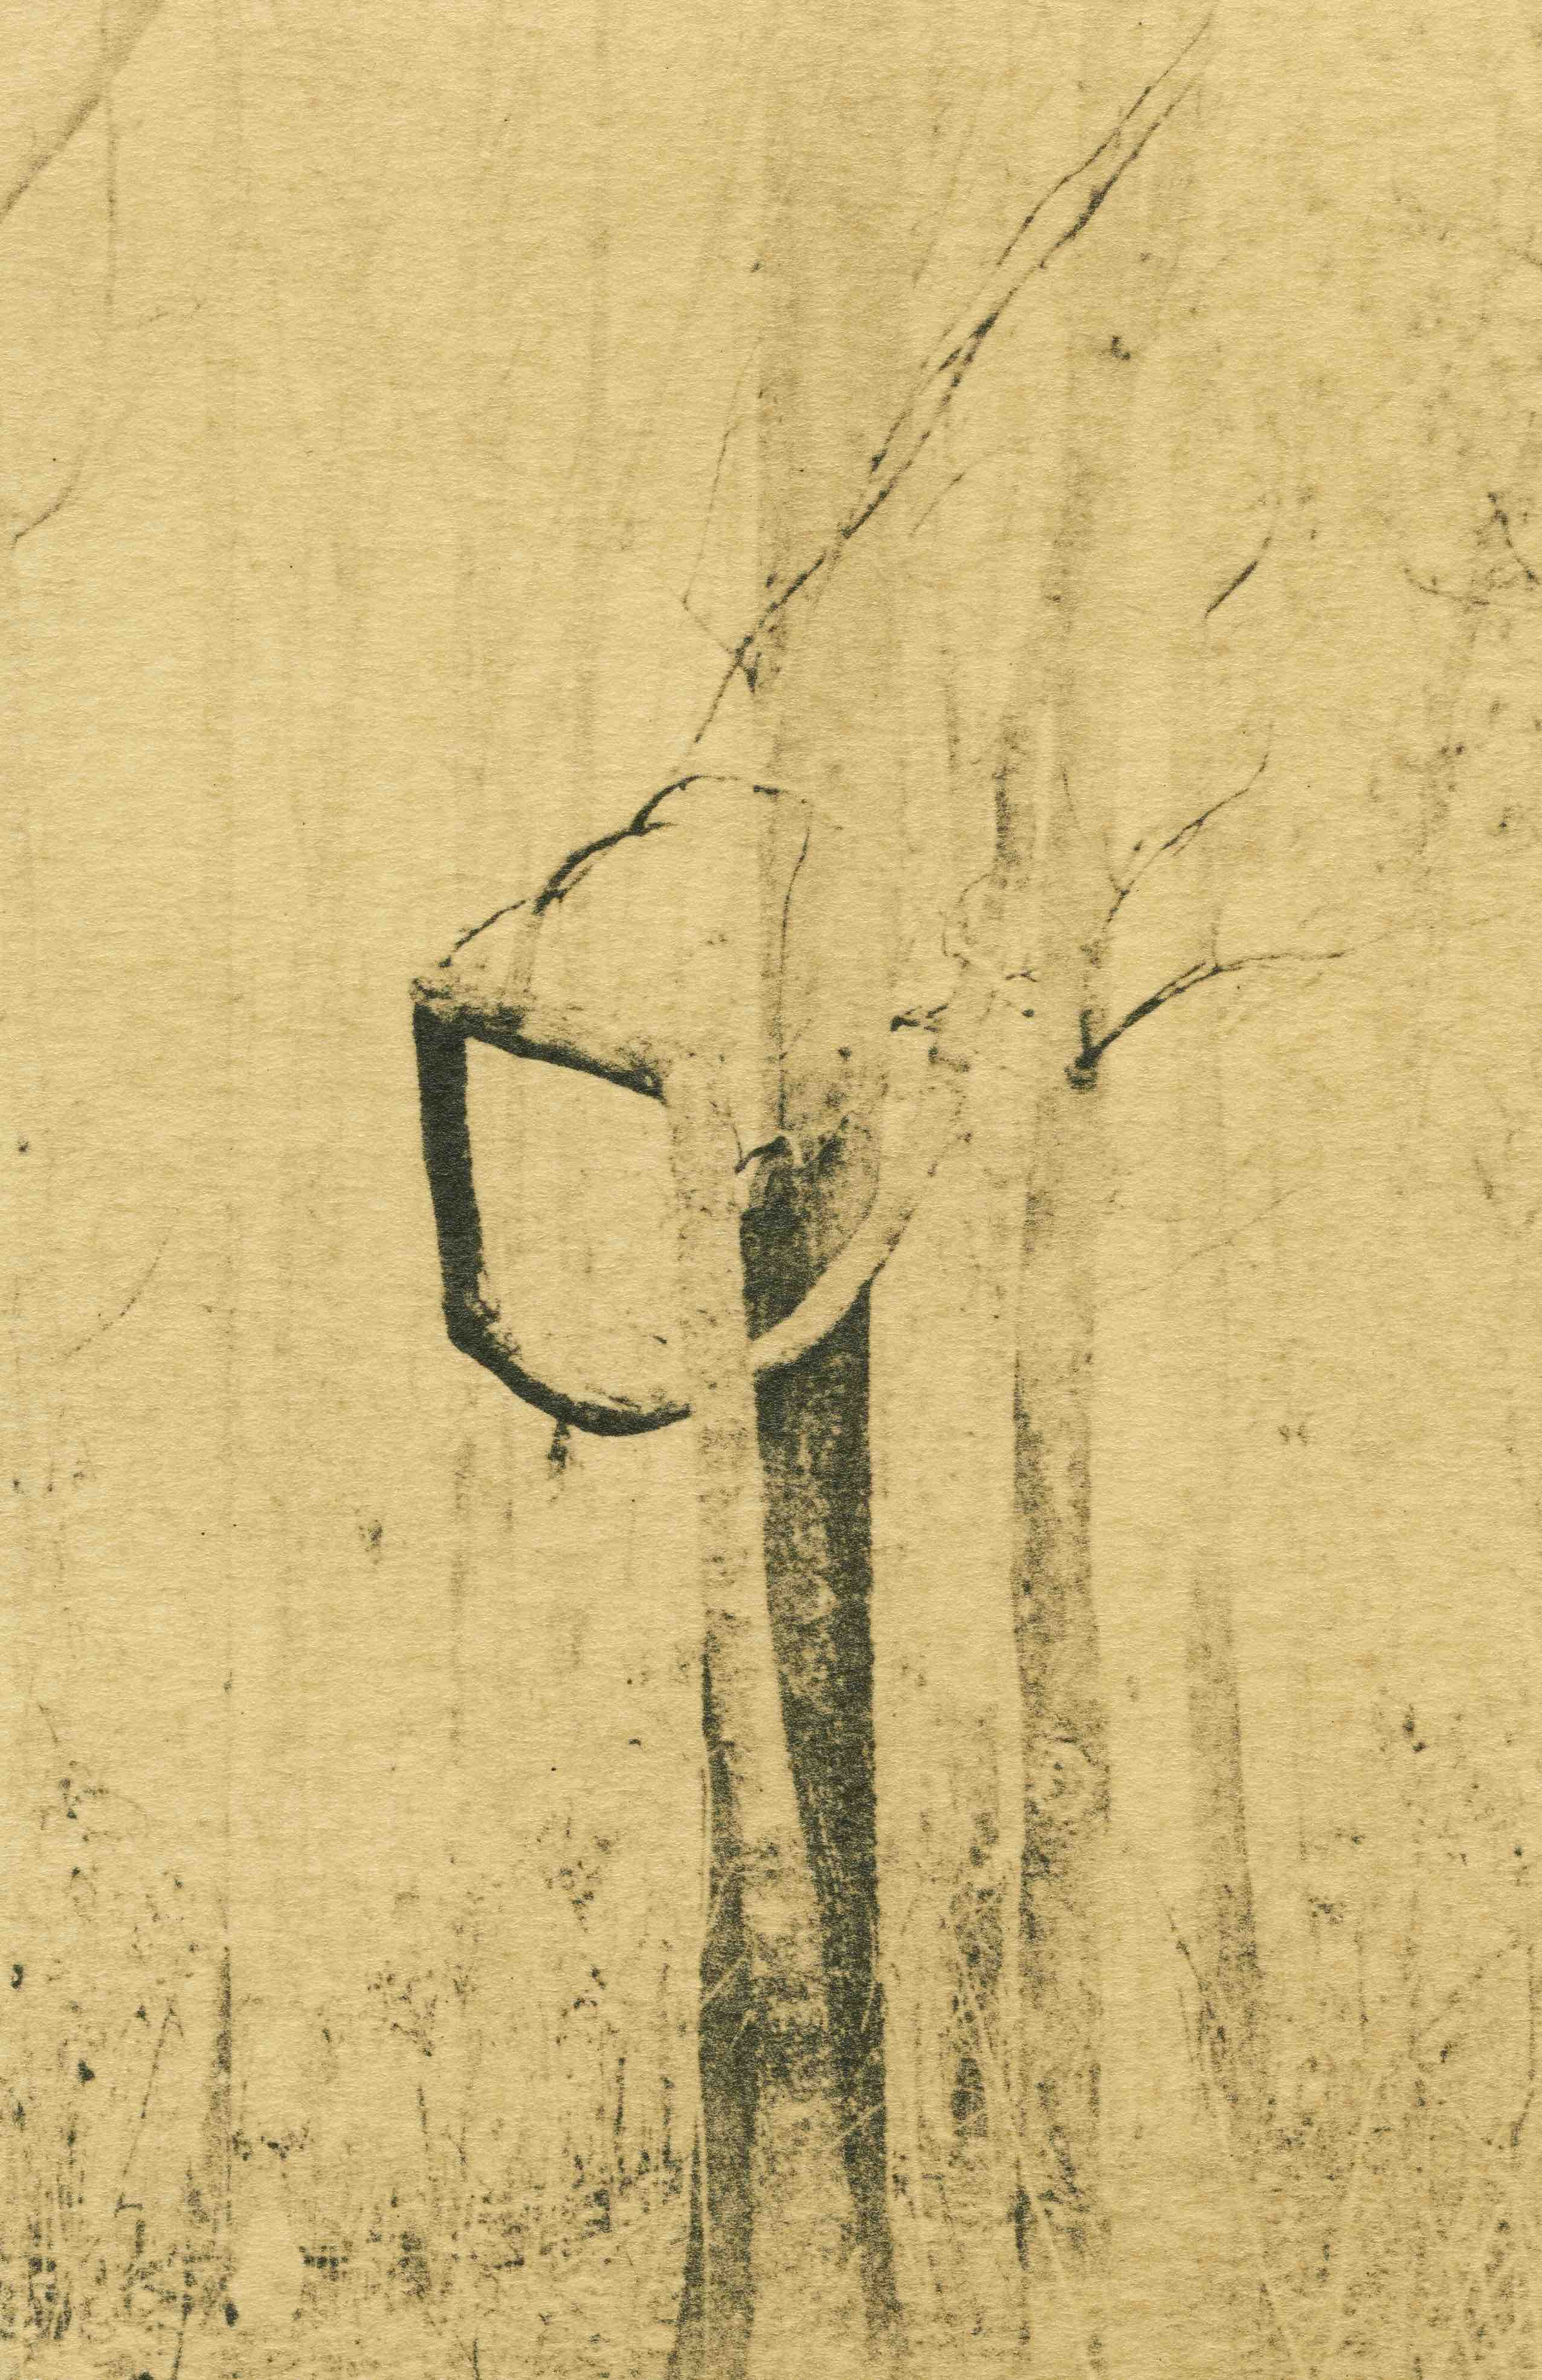 web-fundacio-cabanas-exposicio-temporal-fotografia-andrei-farcasanu-the-quiet-sense-of-nature-5